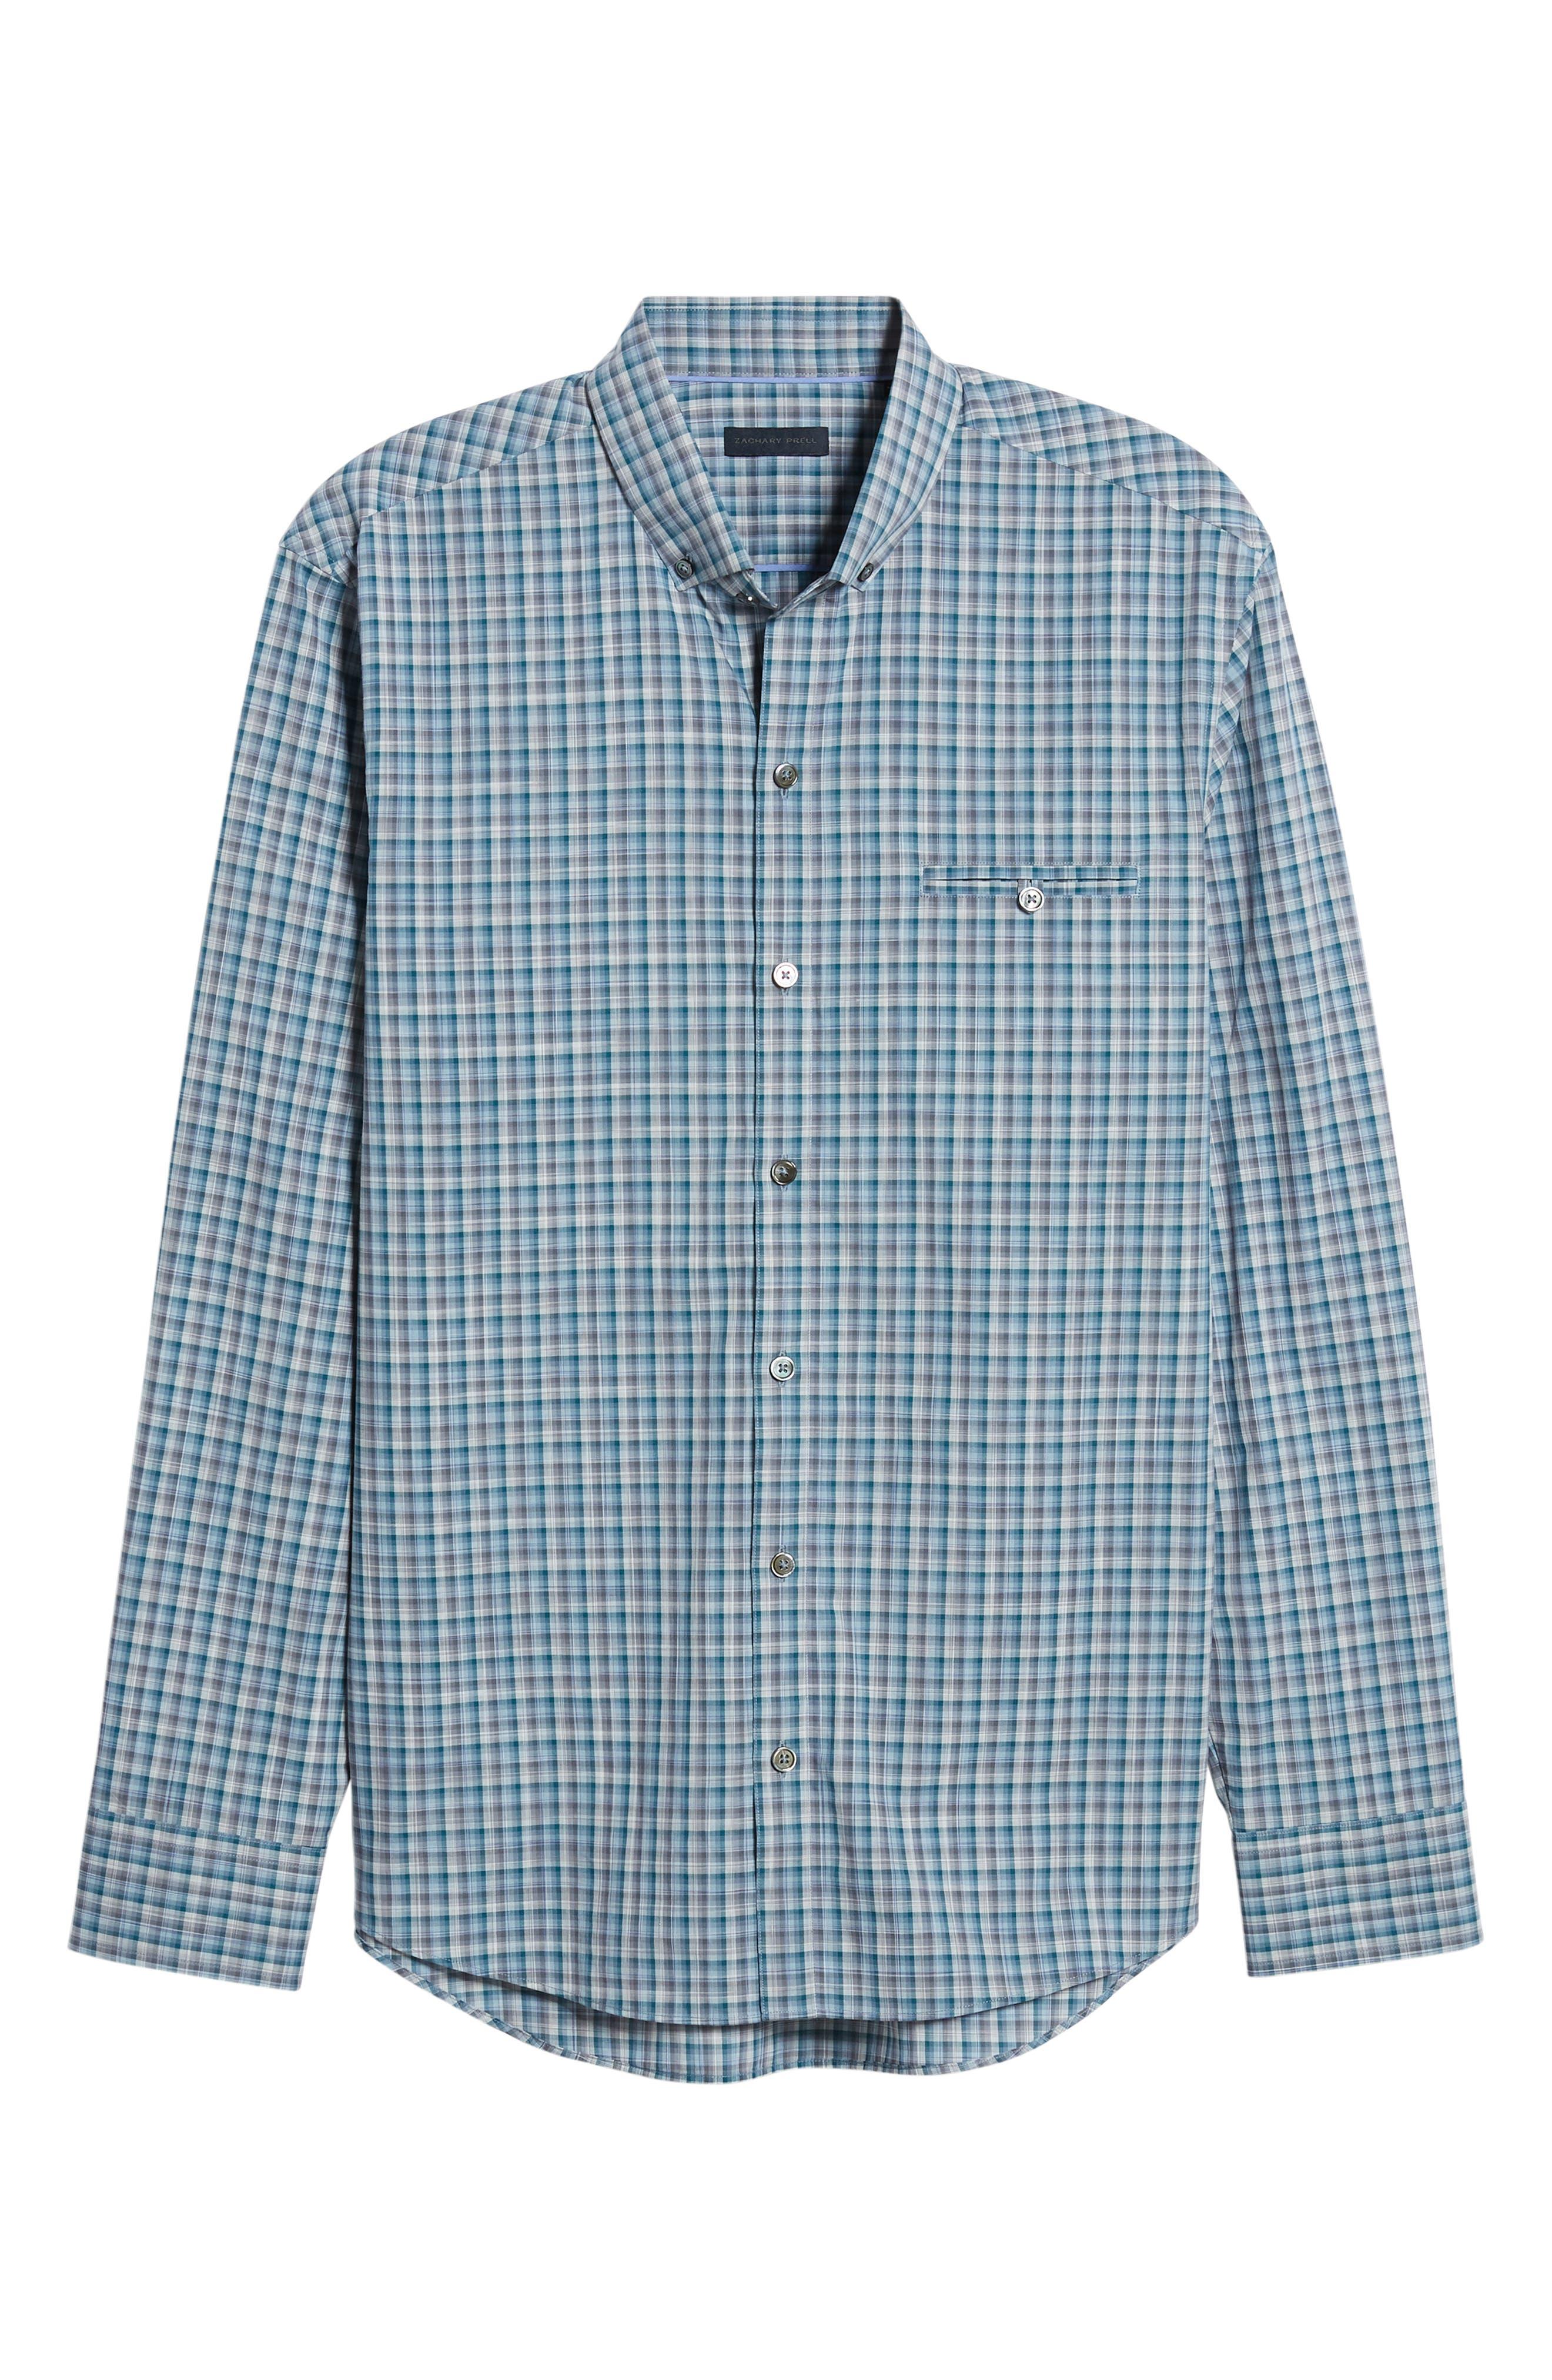 Godinez Check Sport Shirt,                             Alternate thumbnail 5, color,                             DARK TEAL